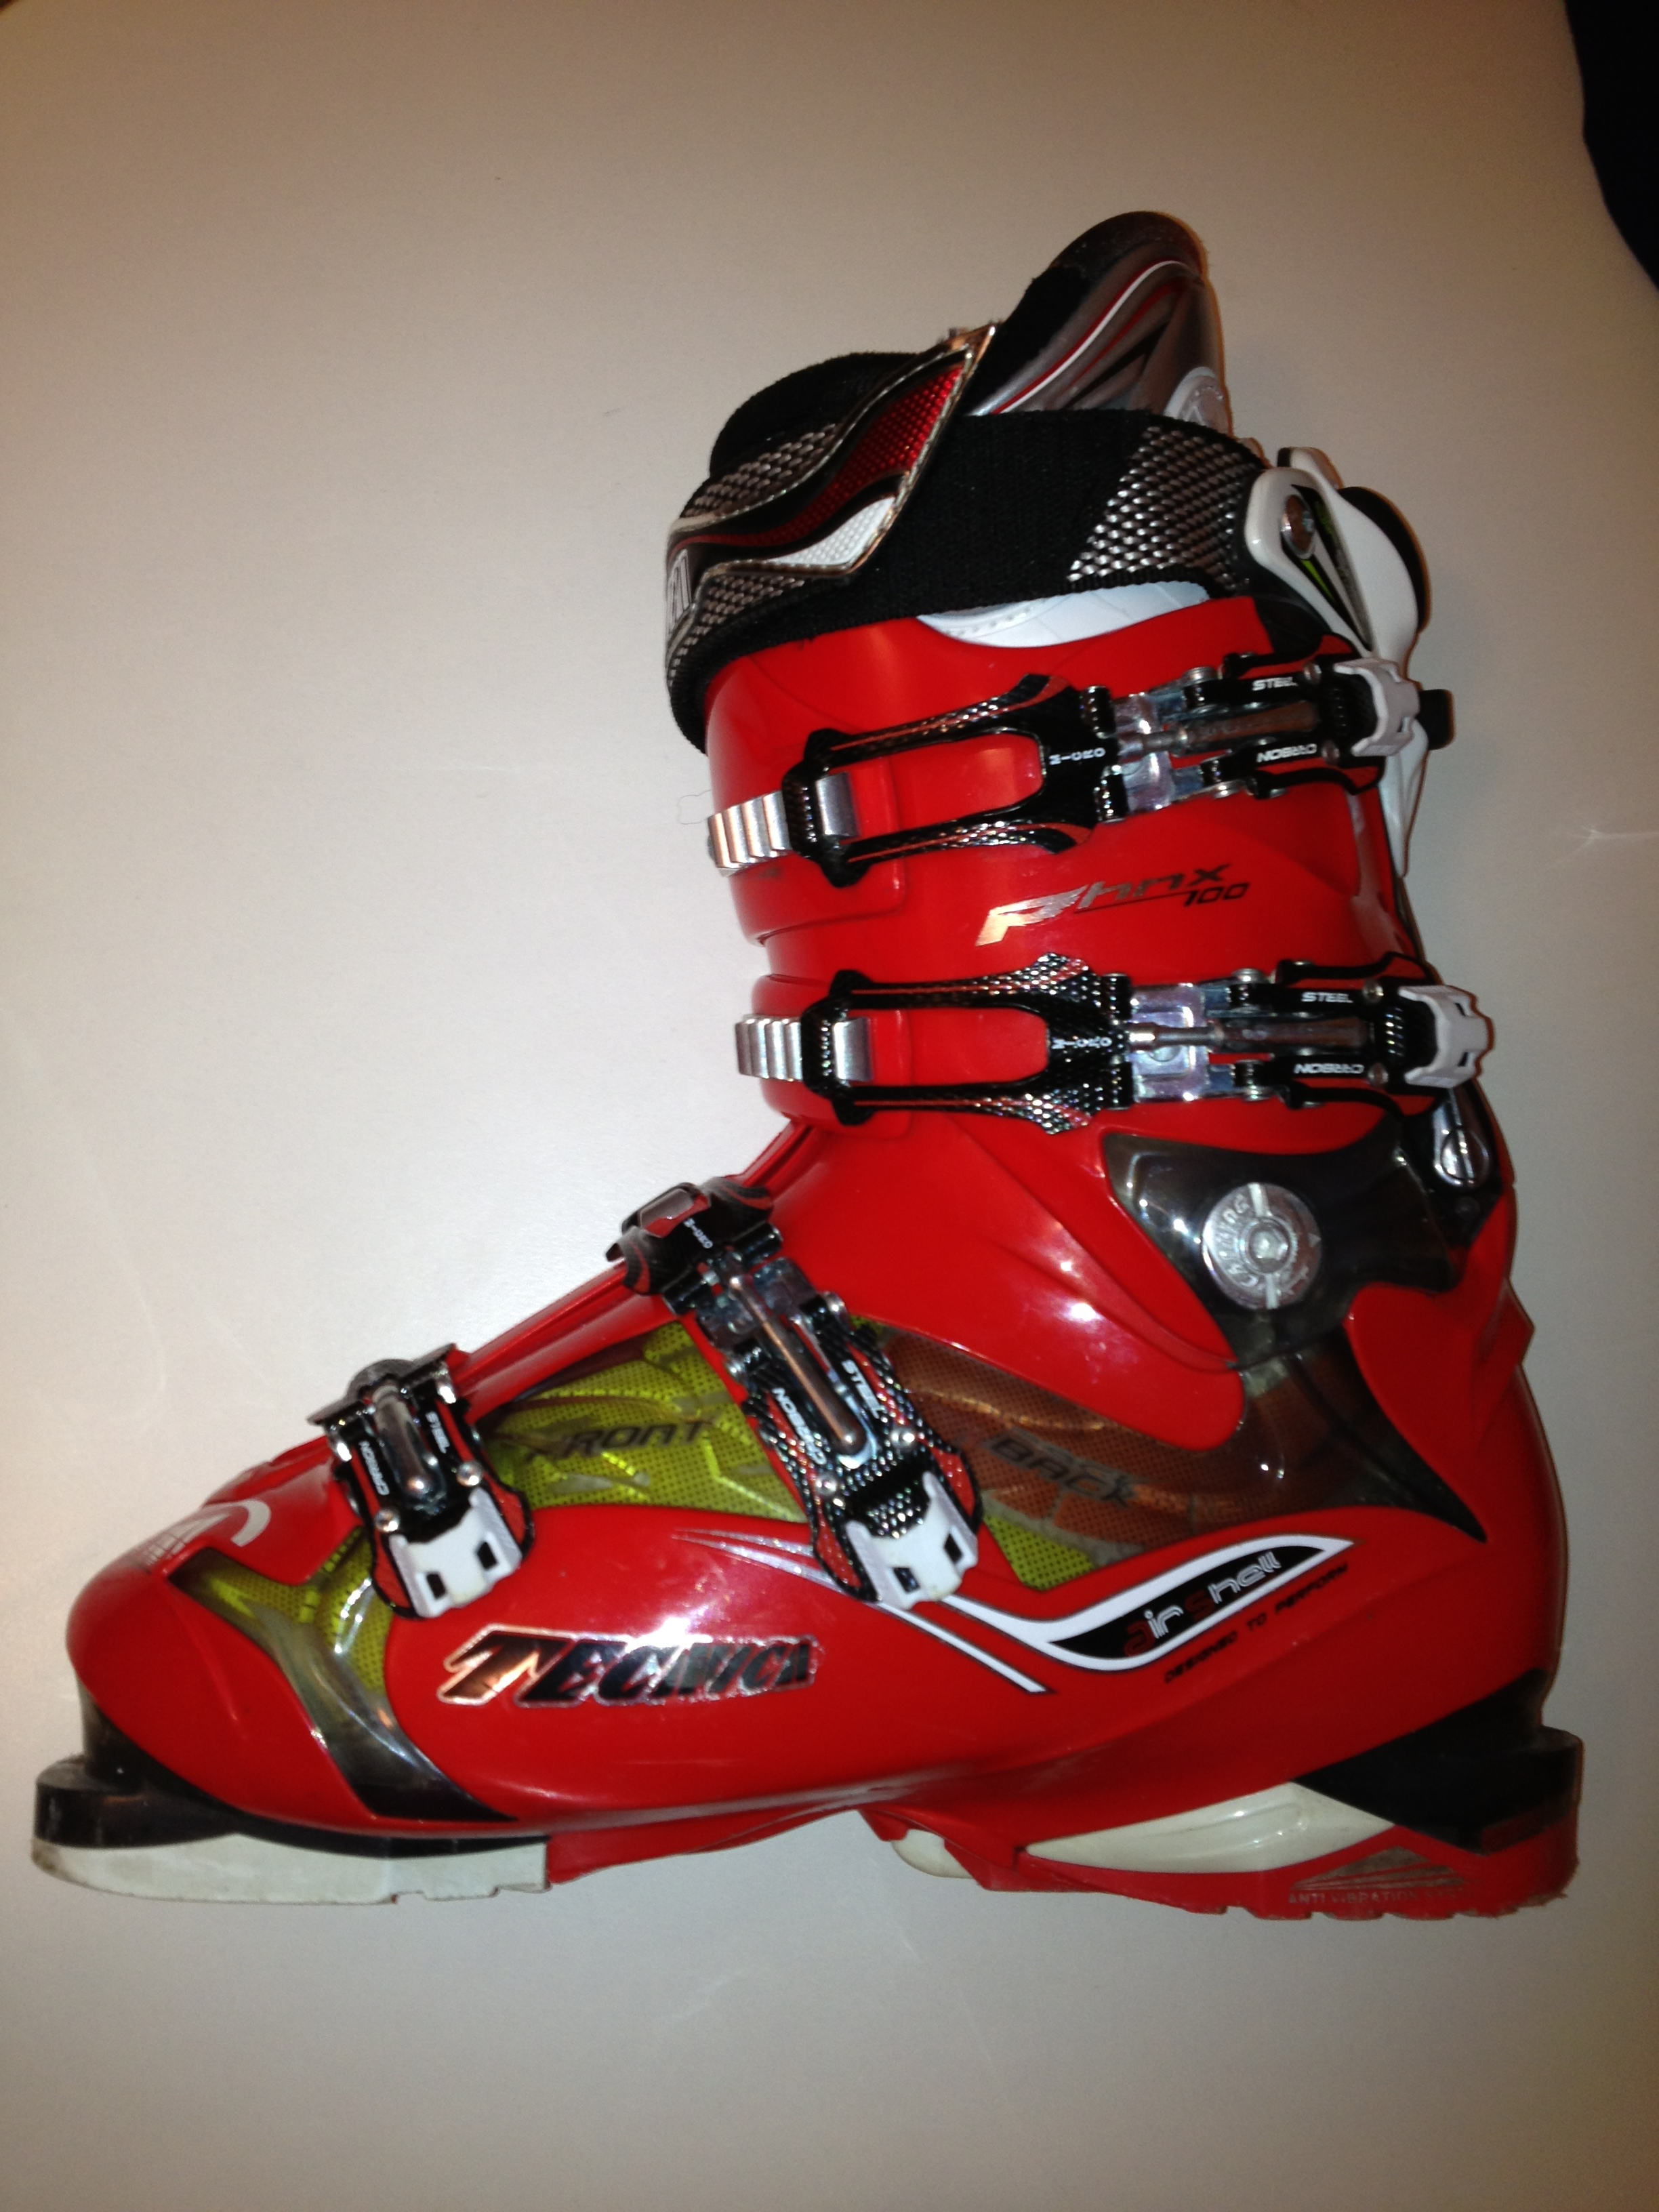 Lyžařské boty Tecnica Phoenix 100 Air Shell - Bazar - SNOW.CZ 88326b4acb